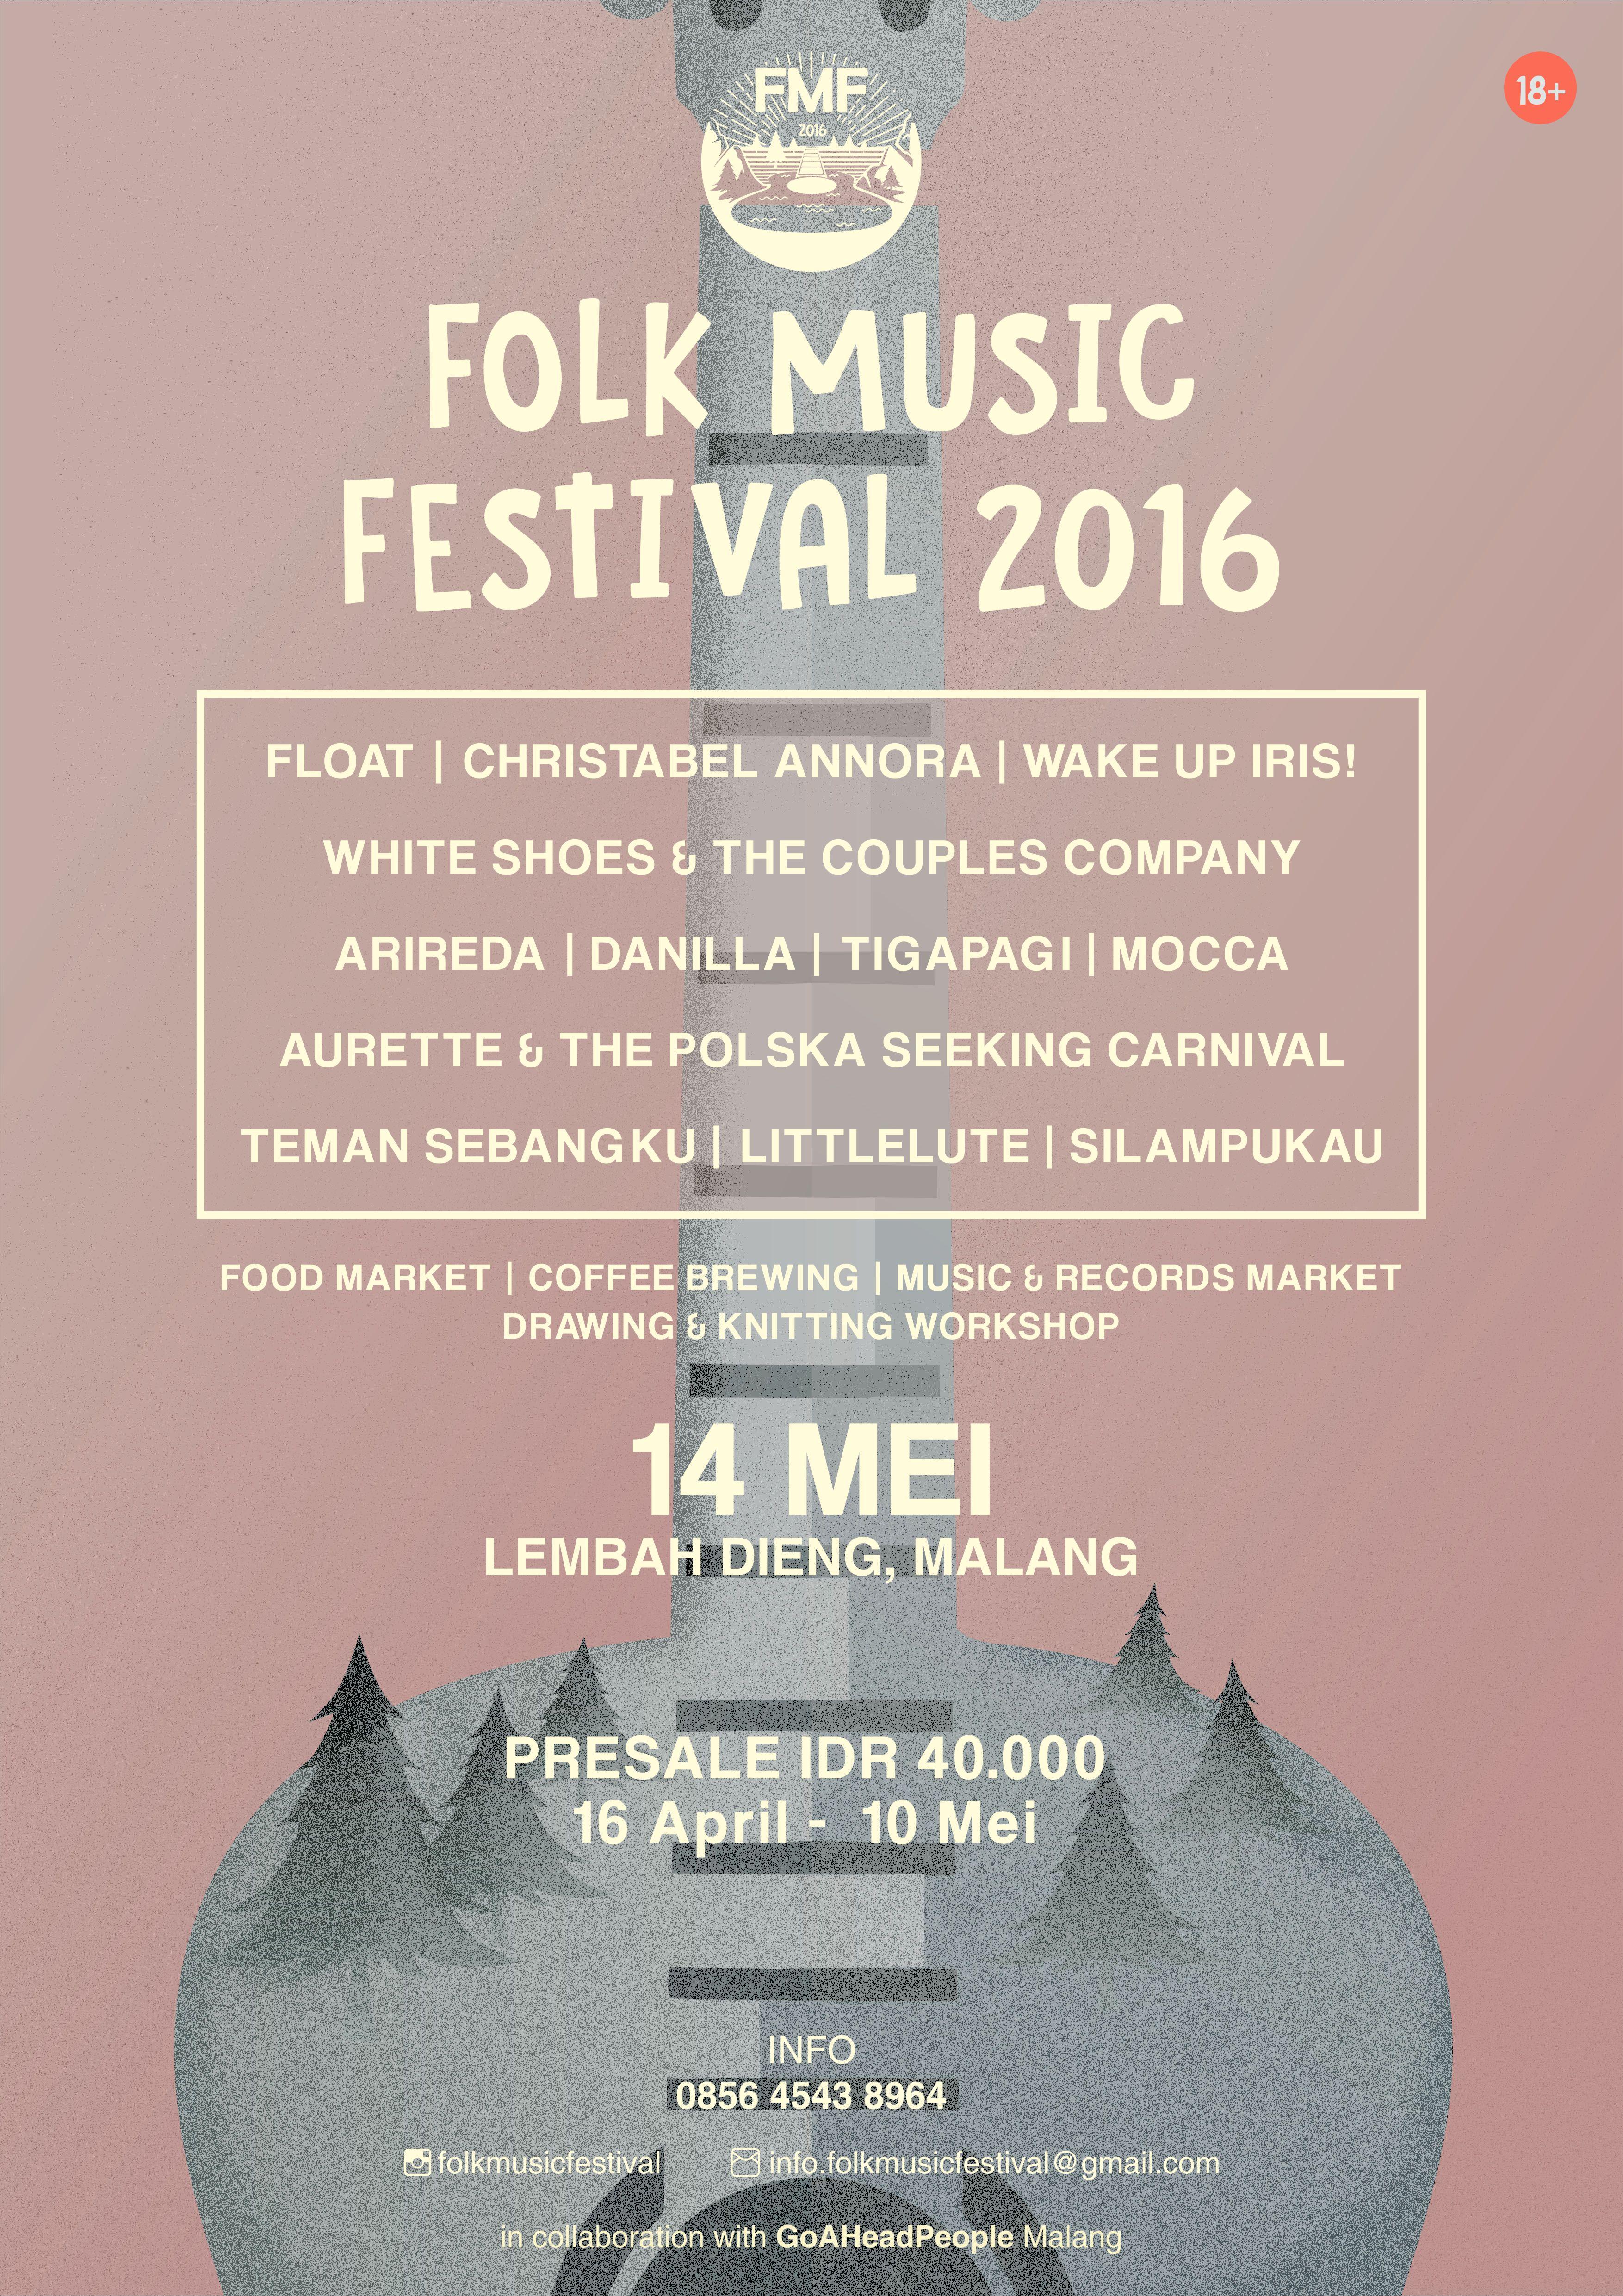 FOLK MUSIC FESTIVAL 2016 (Lembah Dieng, Malang)